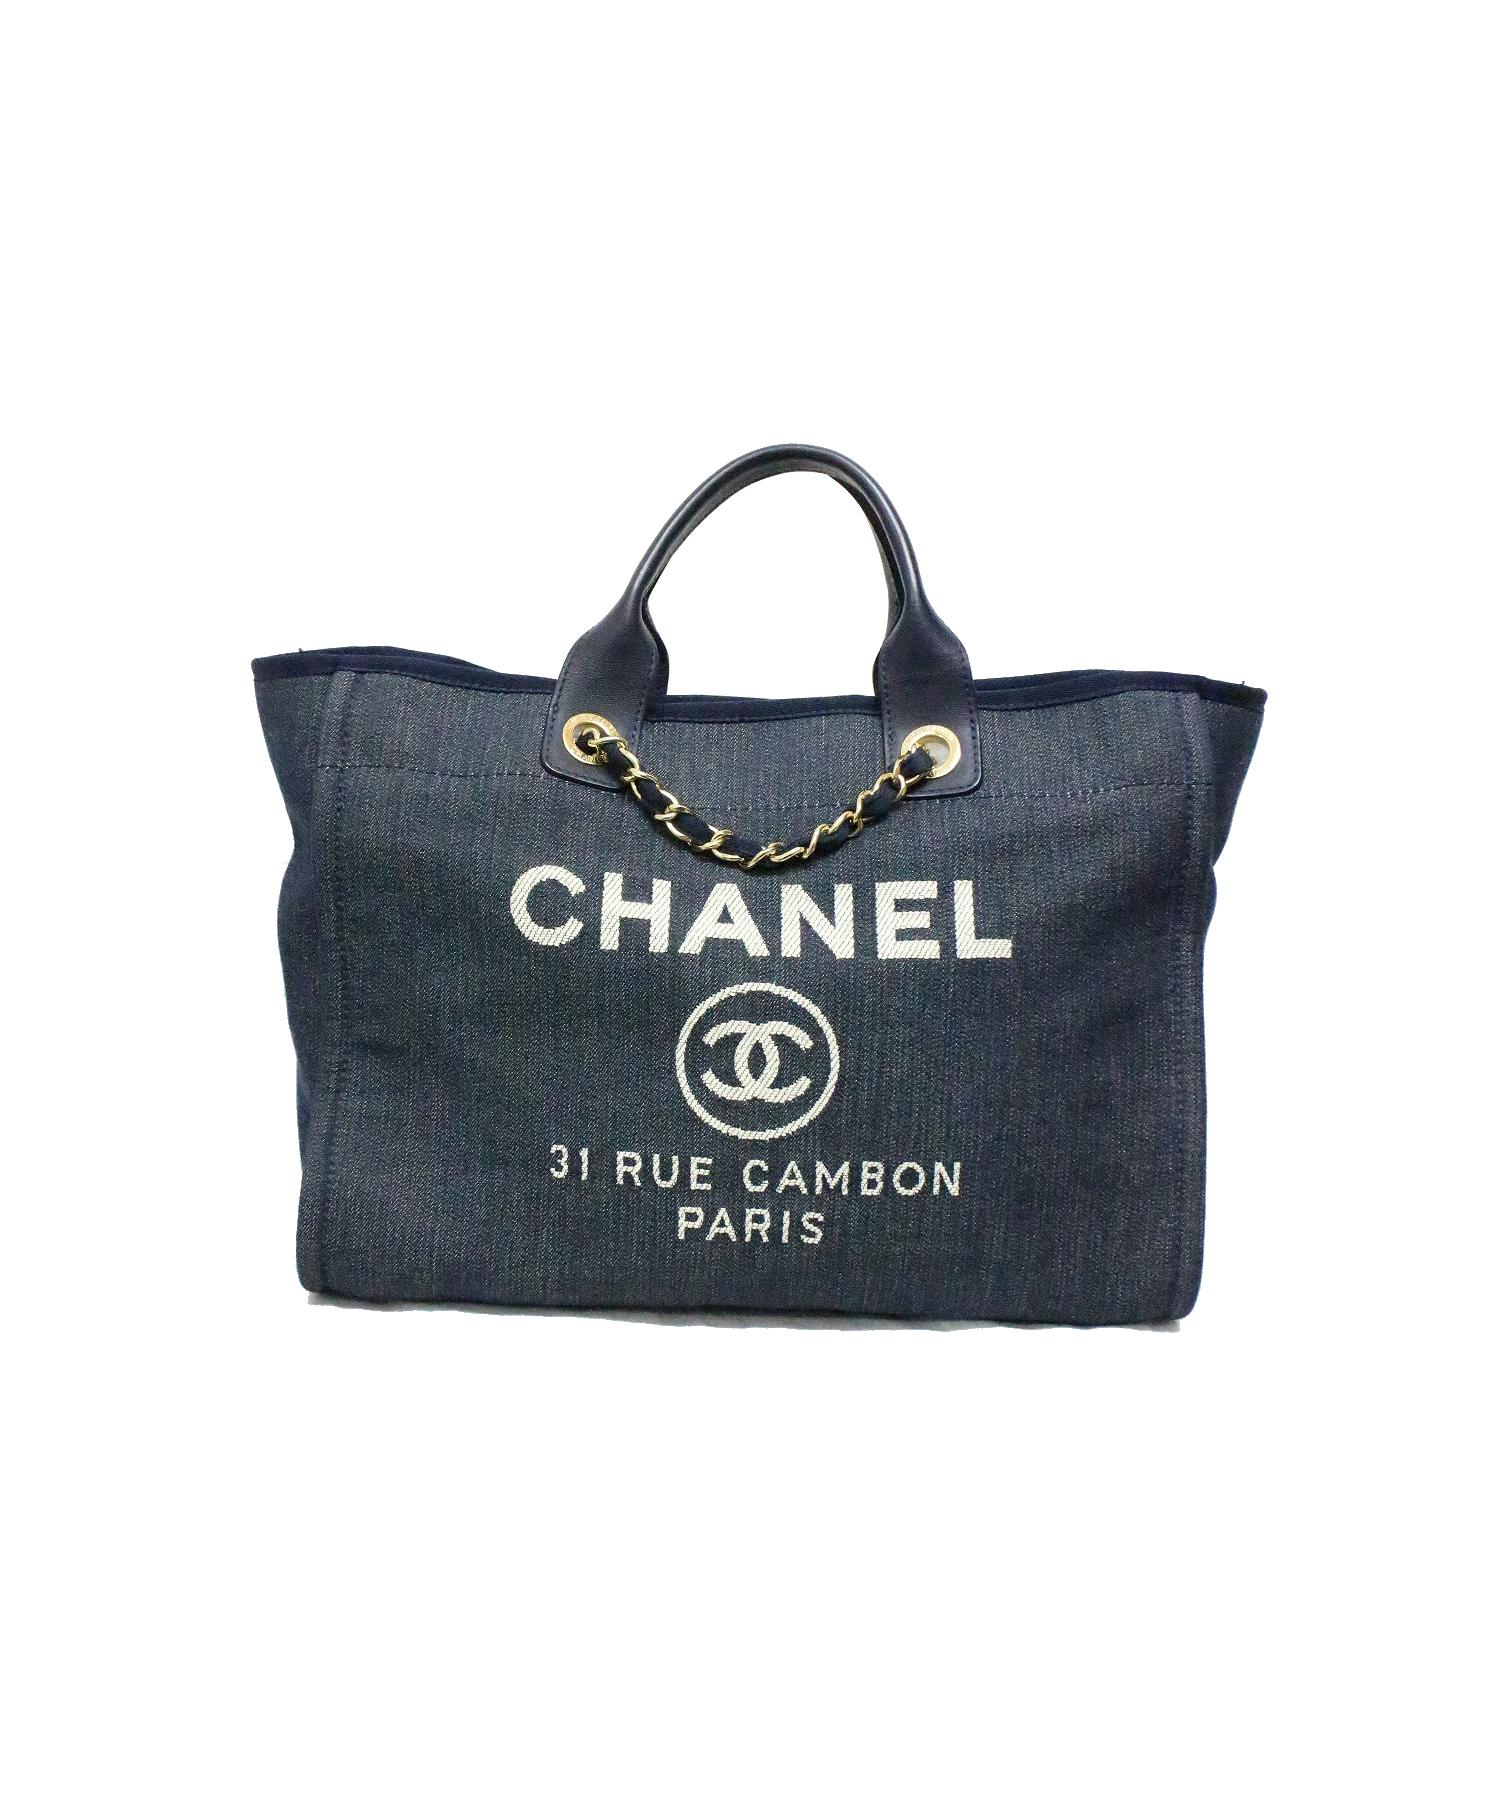 newest collection 3f618 06773 [中古]CHANEL(シャネル)のレディース バッグ デニムチェーントートバッグ